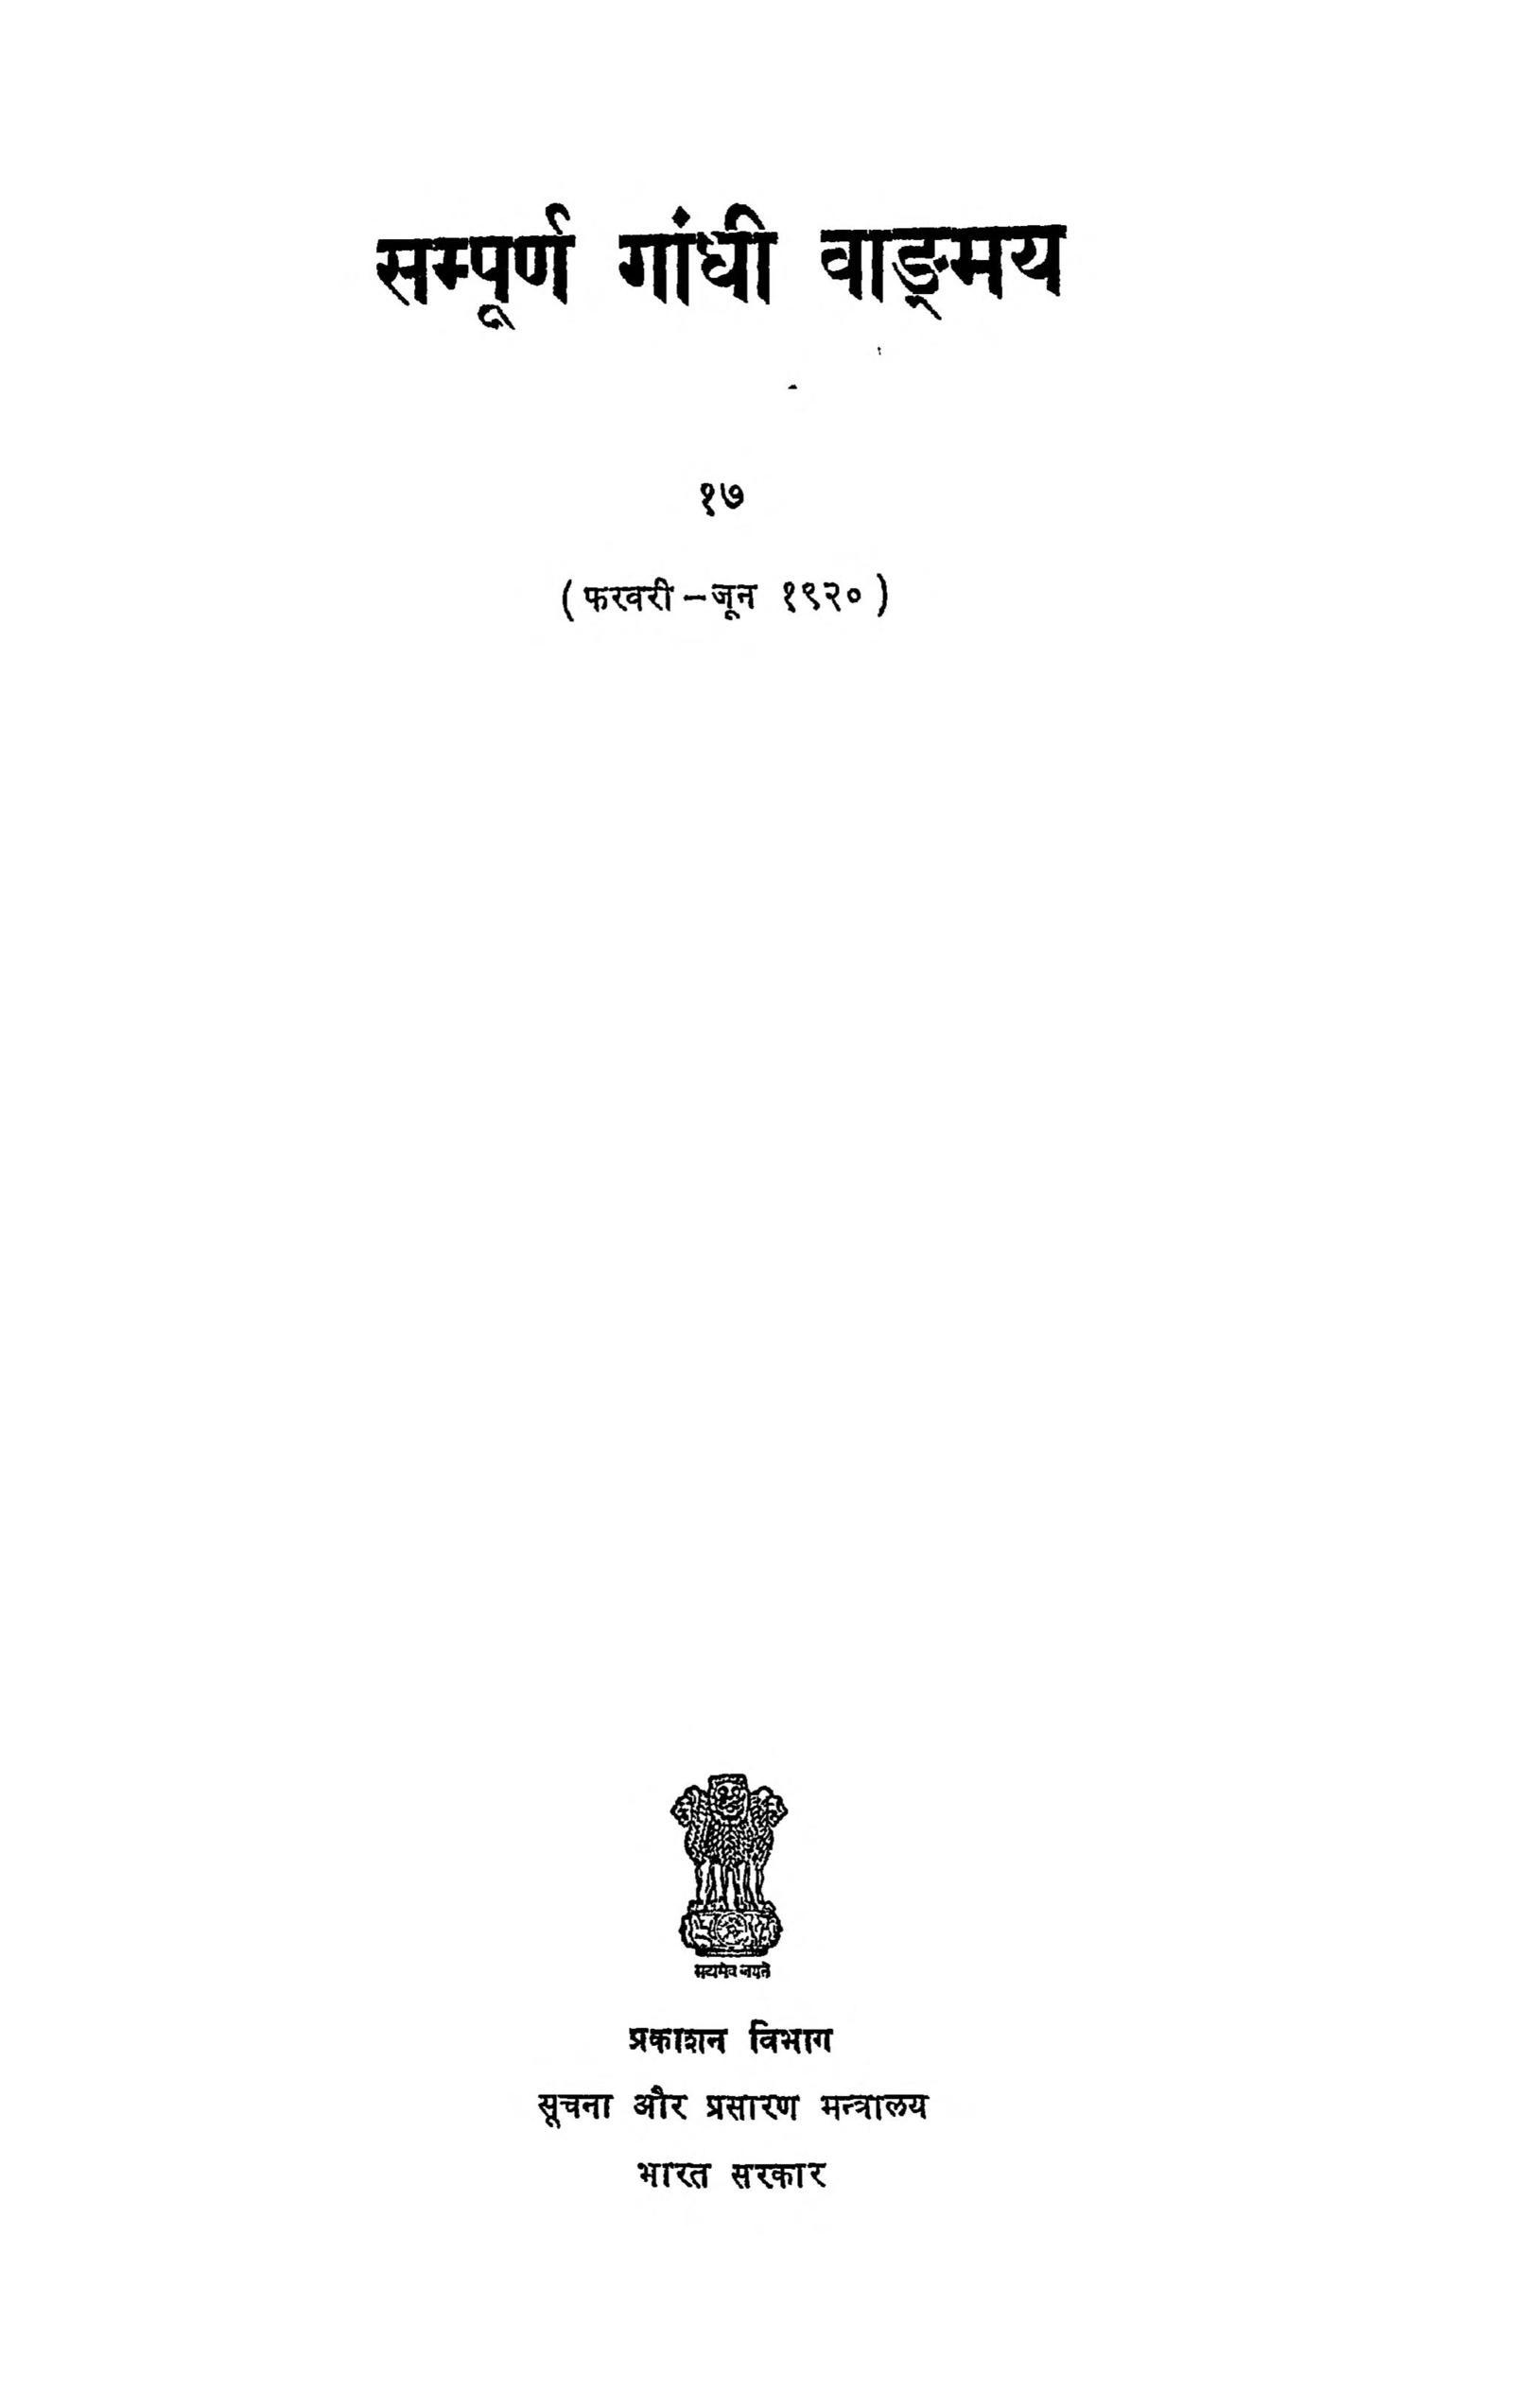 Book Image : सम्पूर्ण गांधी वाङ्मय भाग 17 - Sampurna Gandhi Vangmay Bhag 17